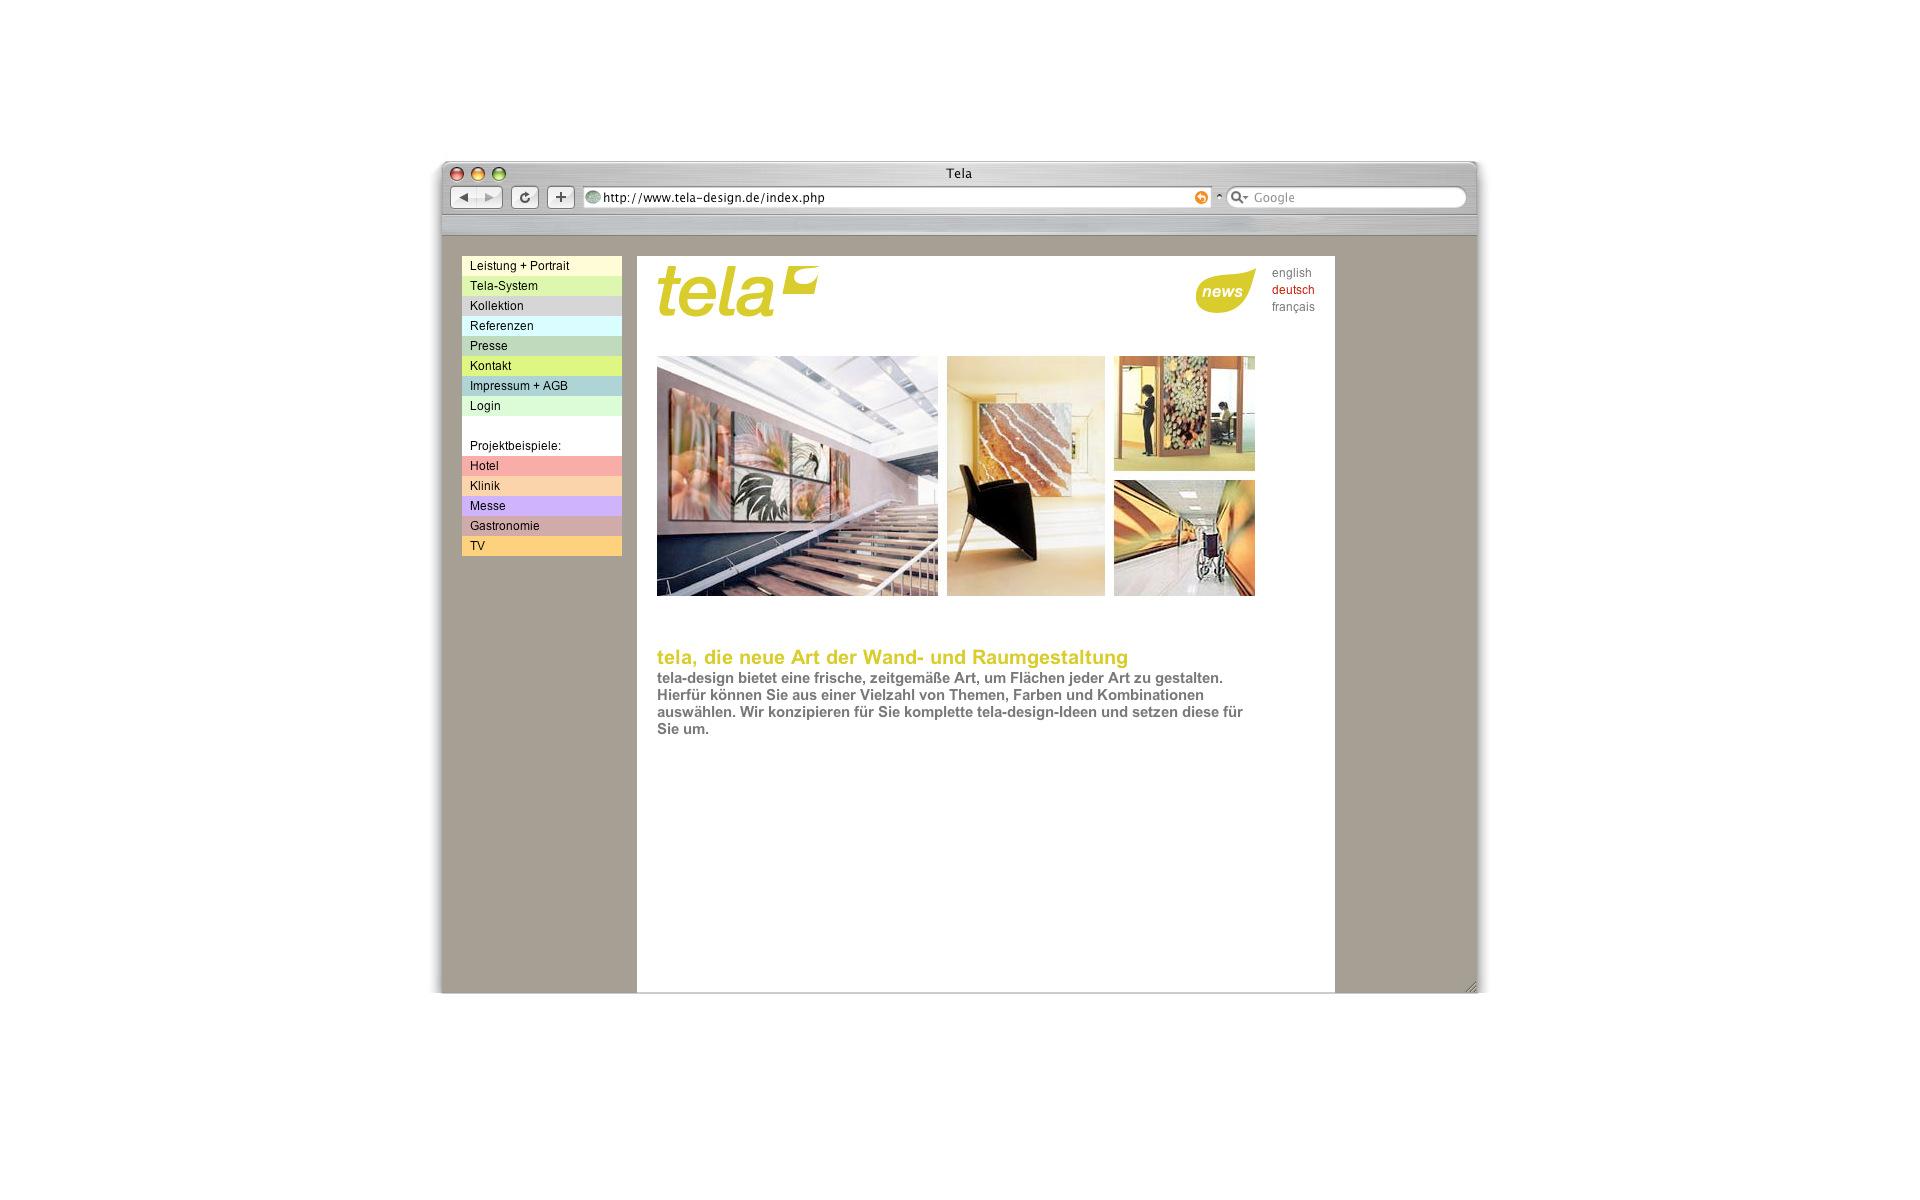 Tela Website Web Shop Design Berlin